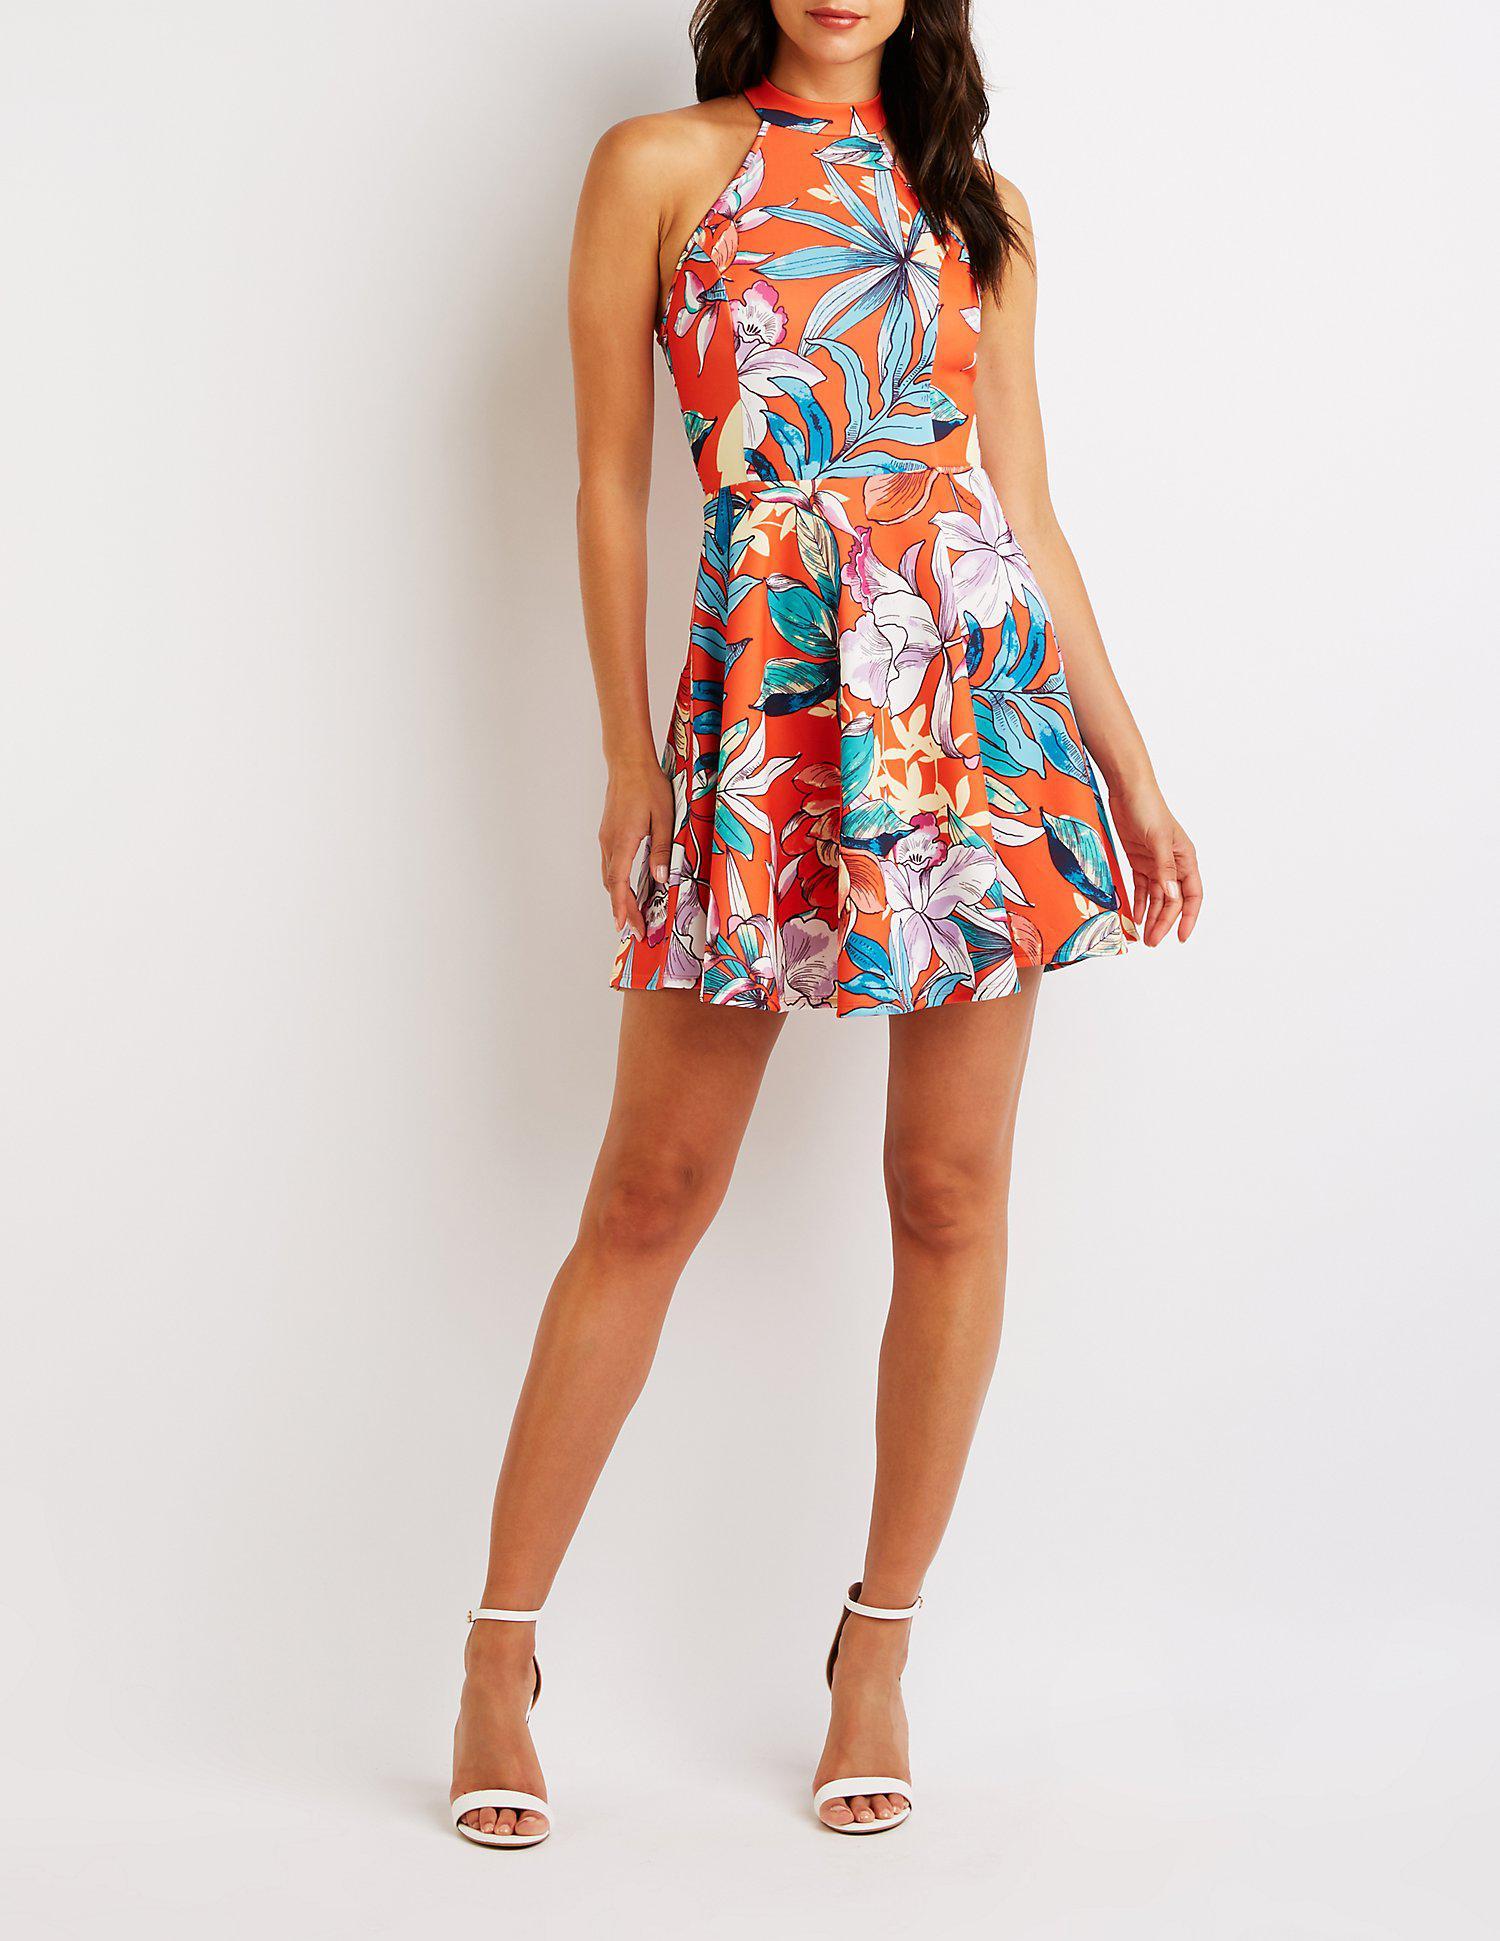 5fc2cf41835c Charlotte Russe - Orange Floral Bib Neck Skater Dress - Lyst. View  fullscreen